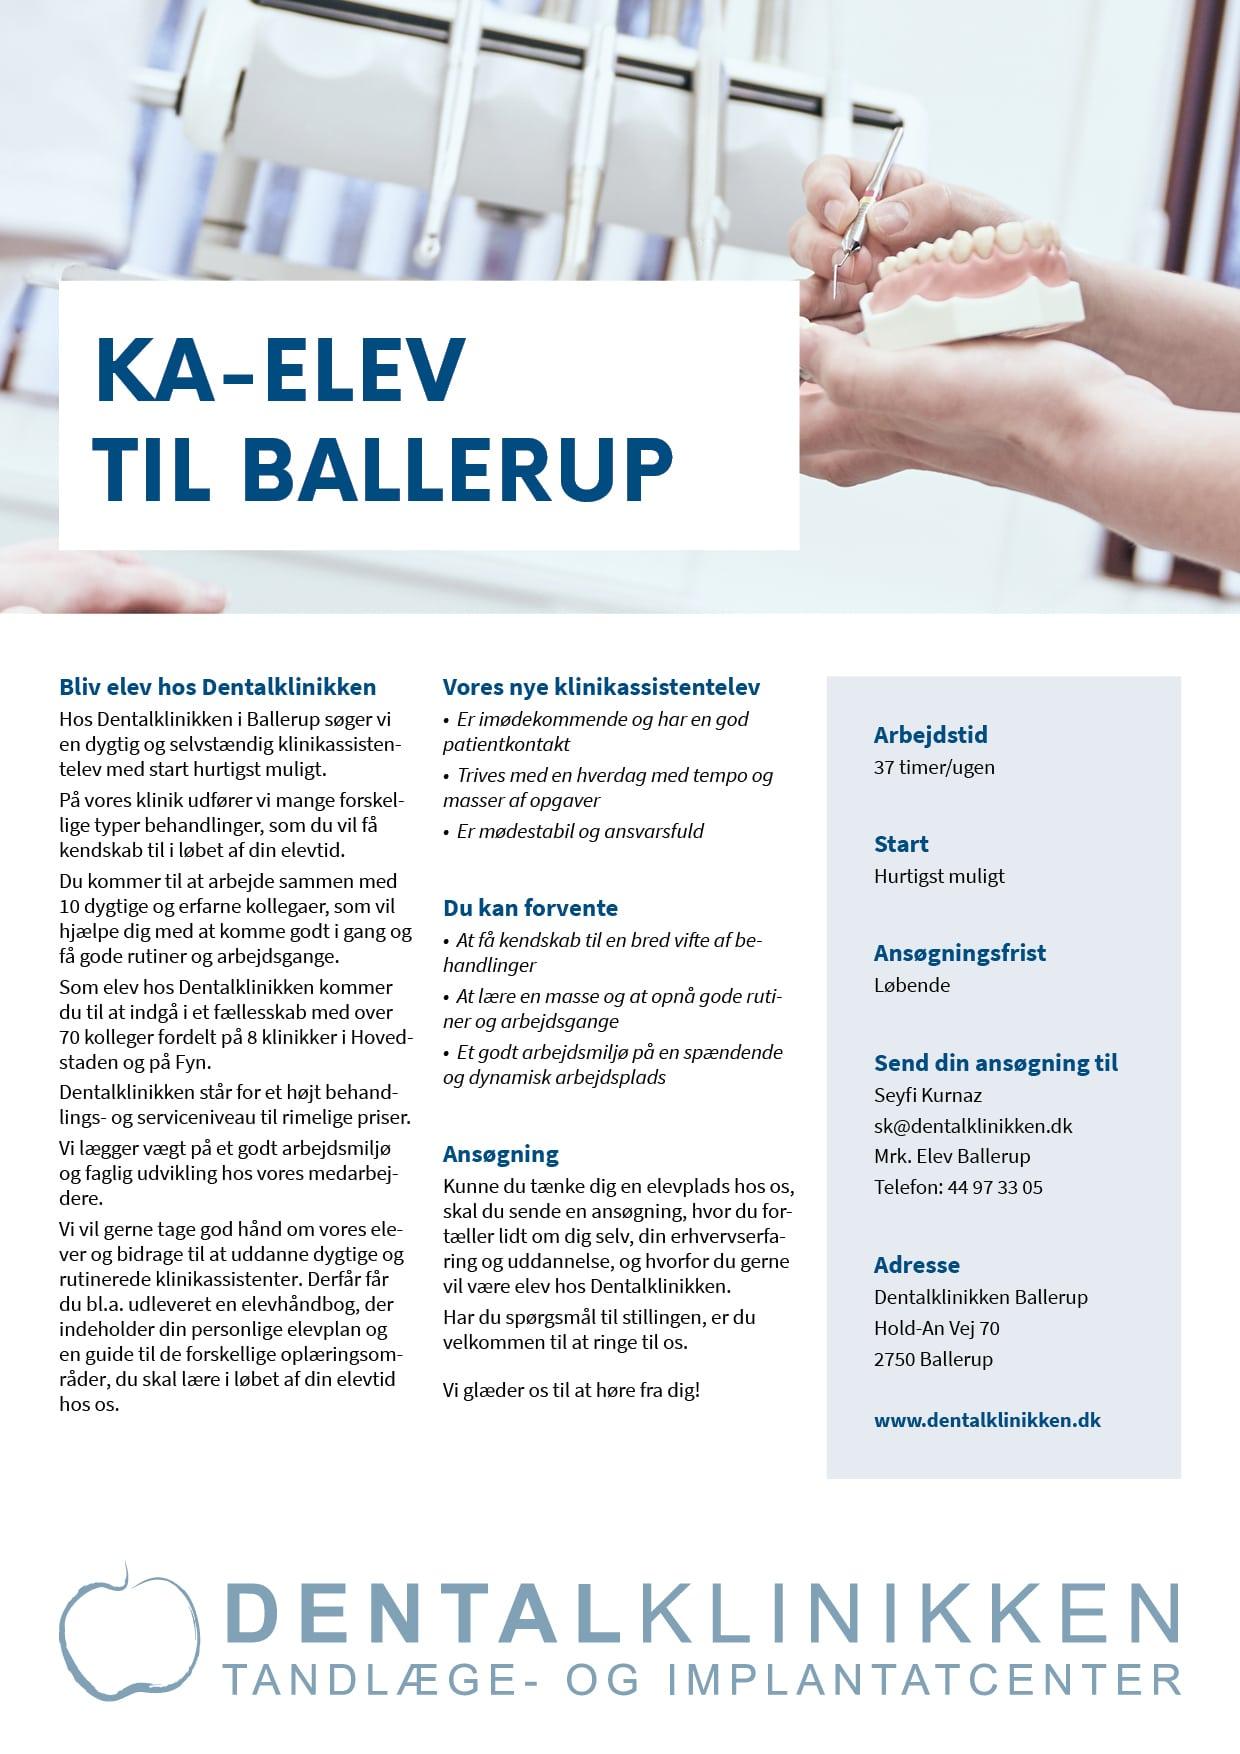 KA-Elev Ballerup